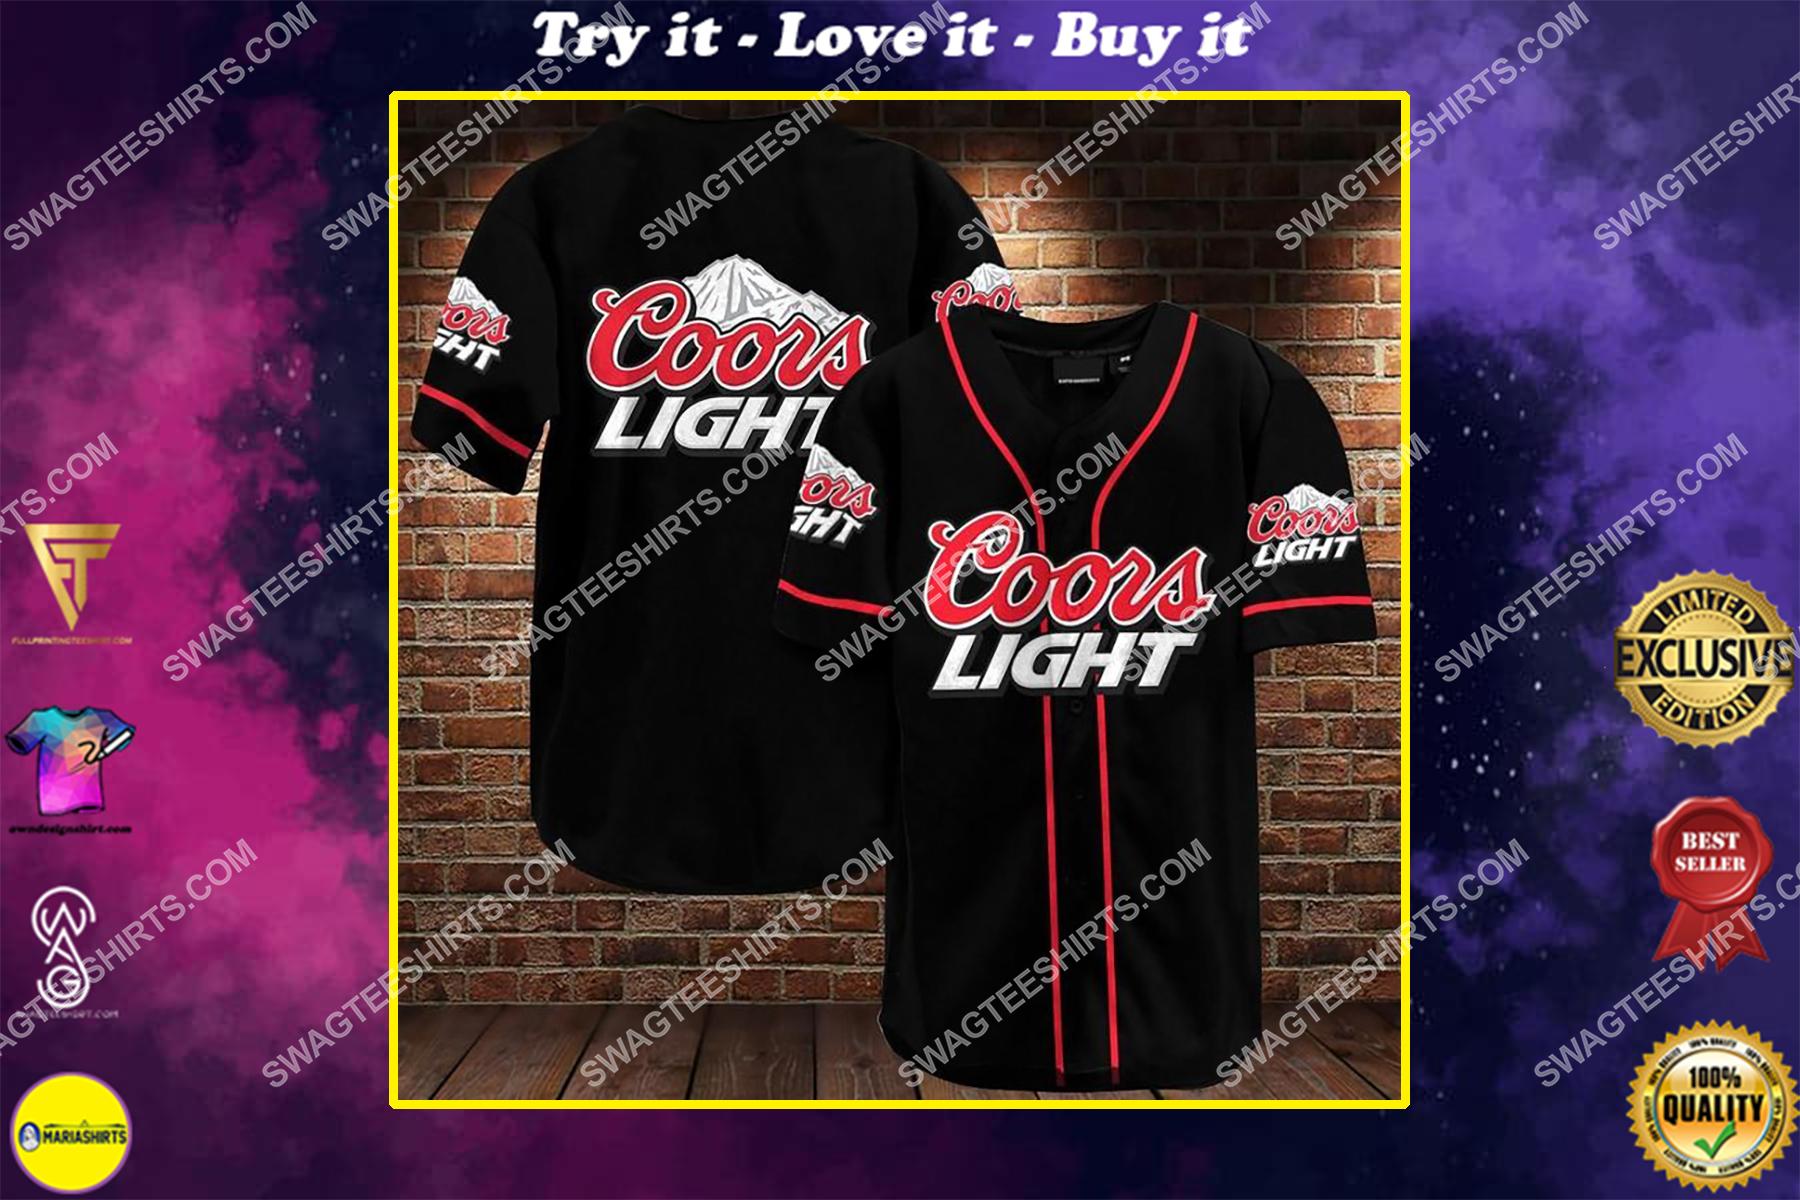 the coors light all over printed baseball shirt